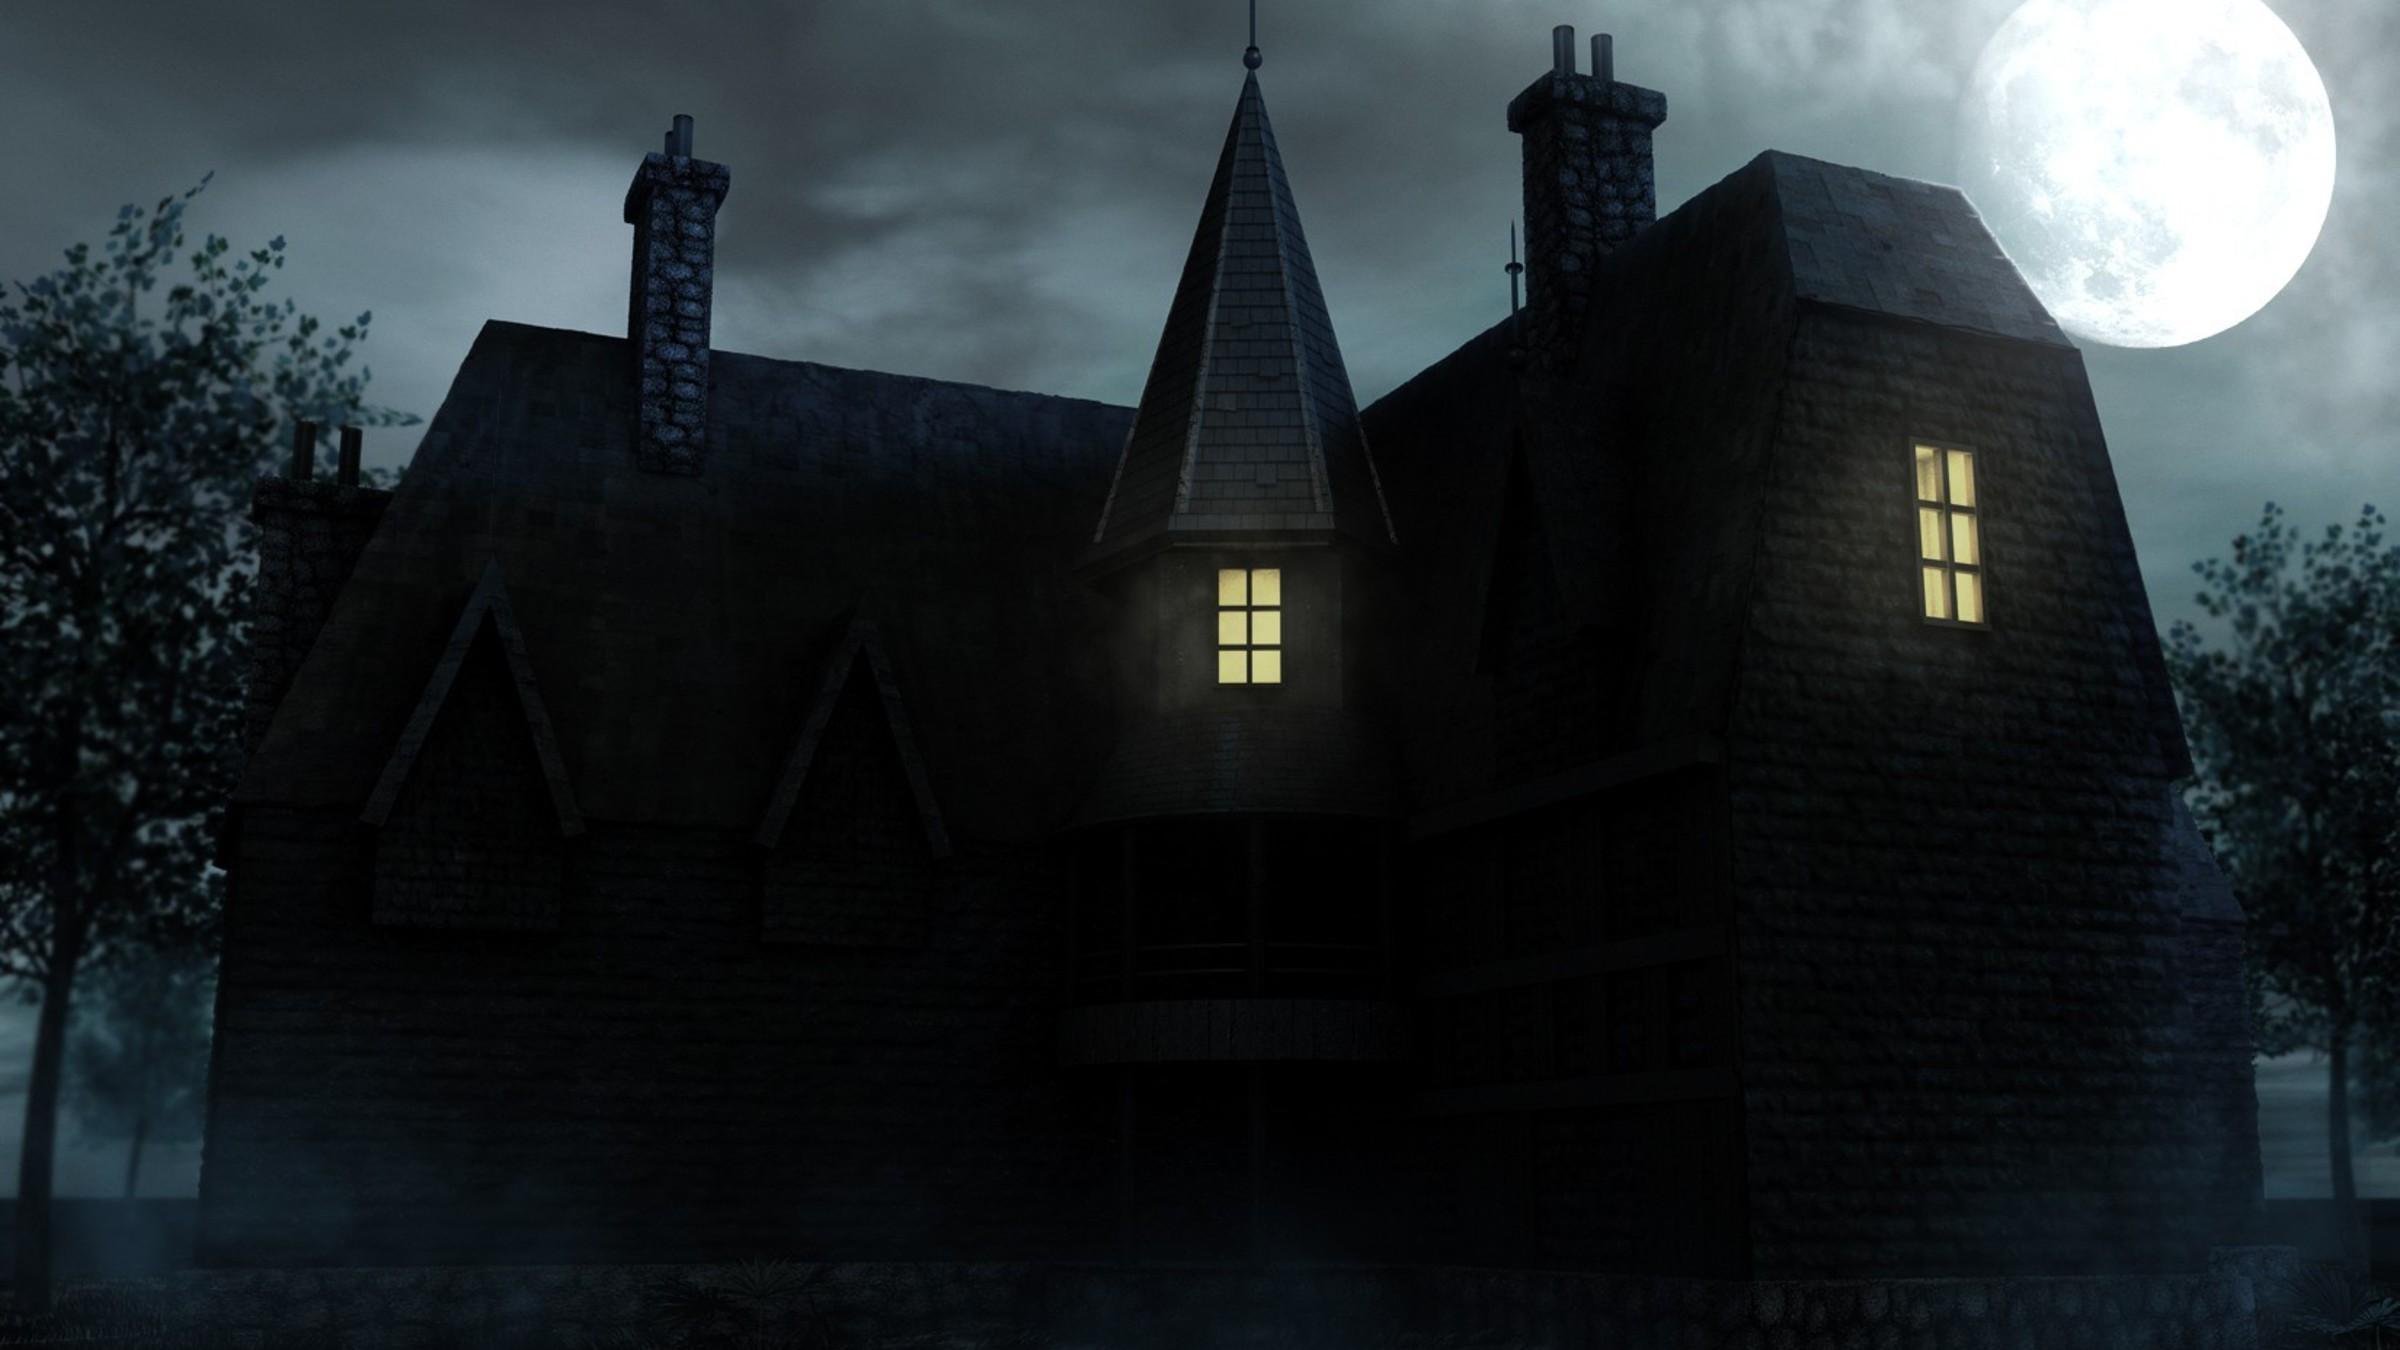 Scooby doo haunted house 3d graphics wallpaper 2400x1350